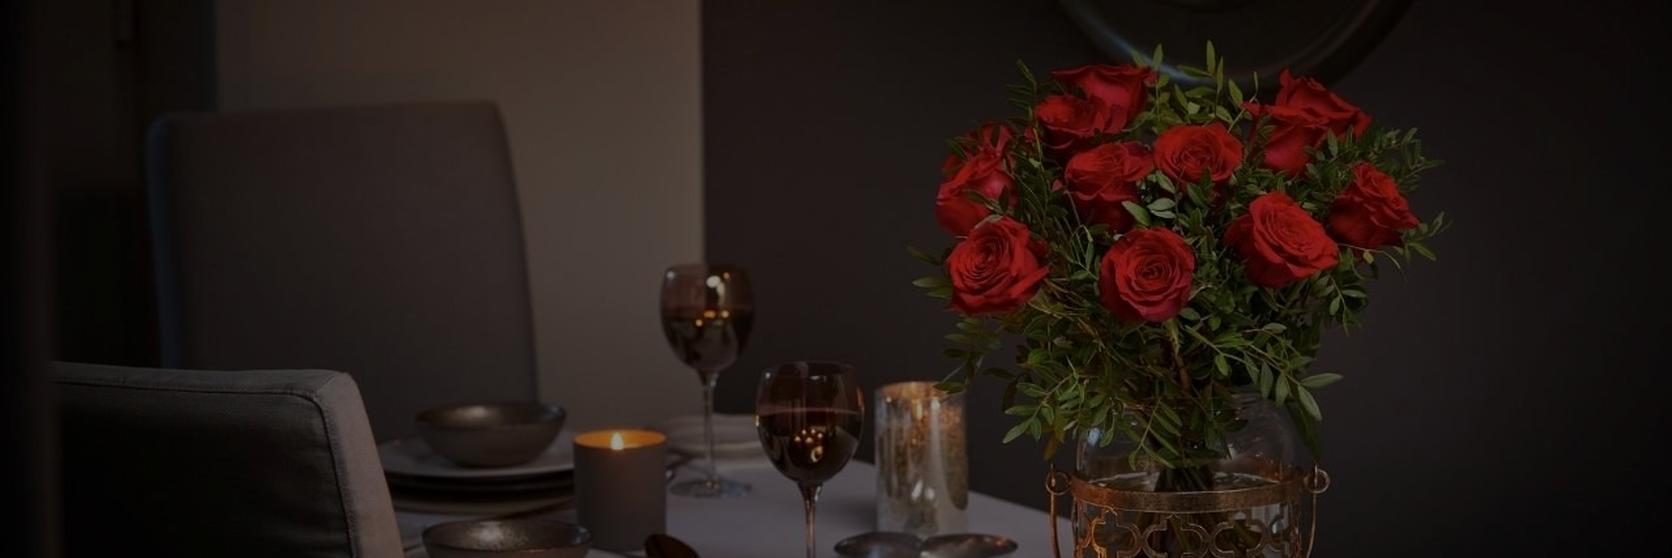 ideas-for-celebrating-valentines-day-in-lockdown-1